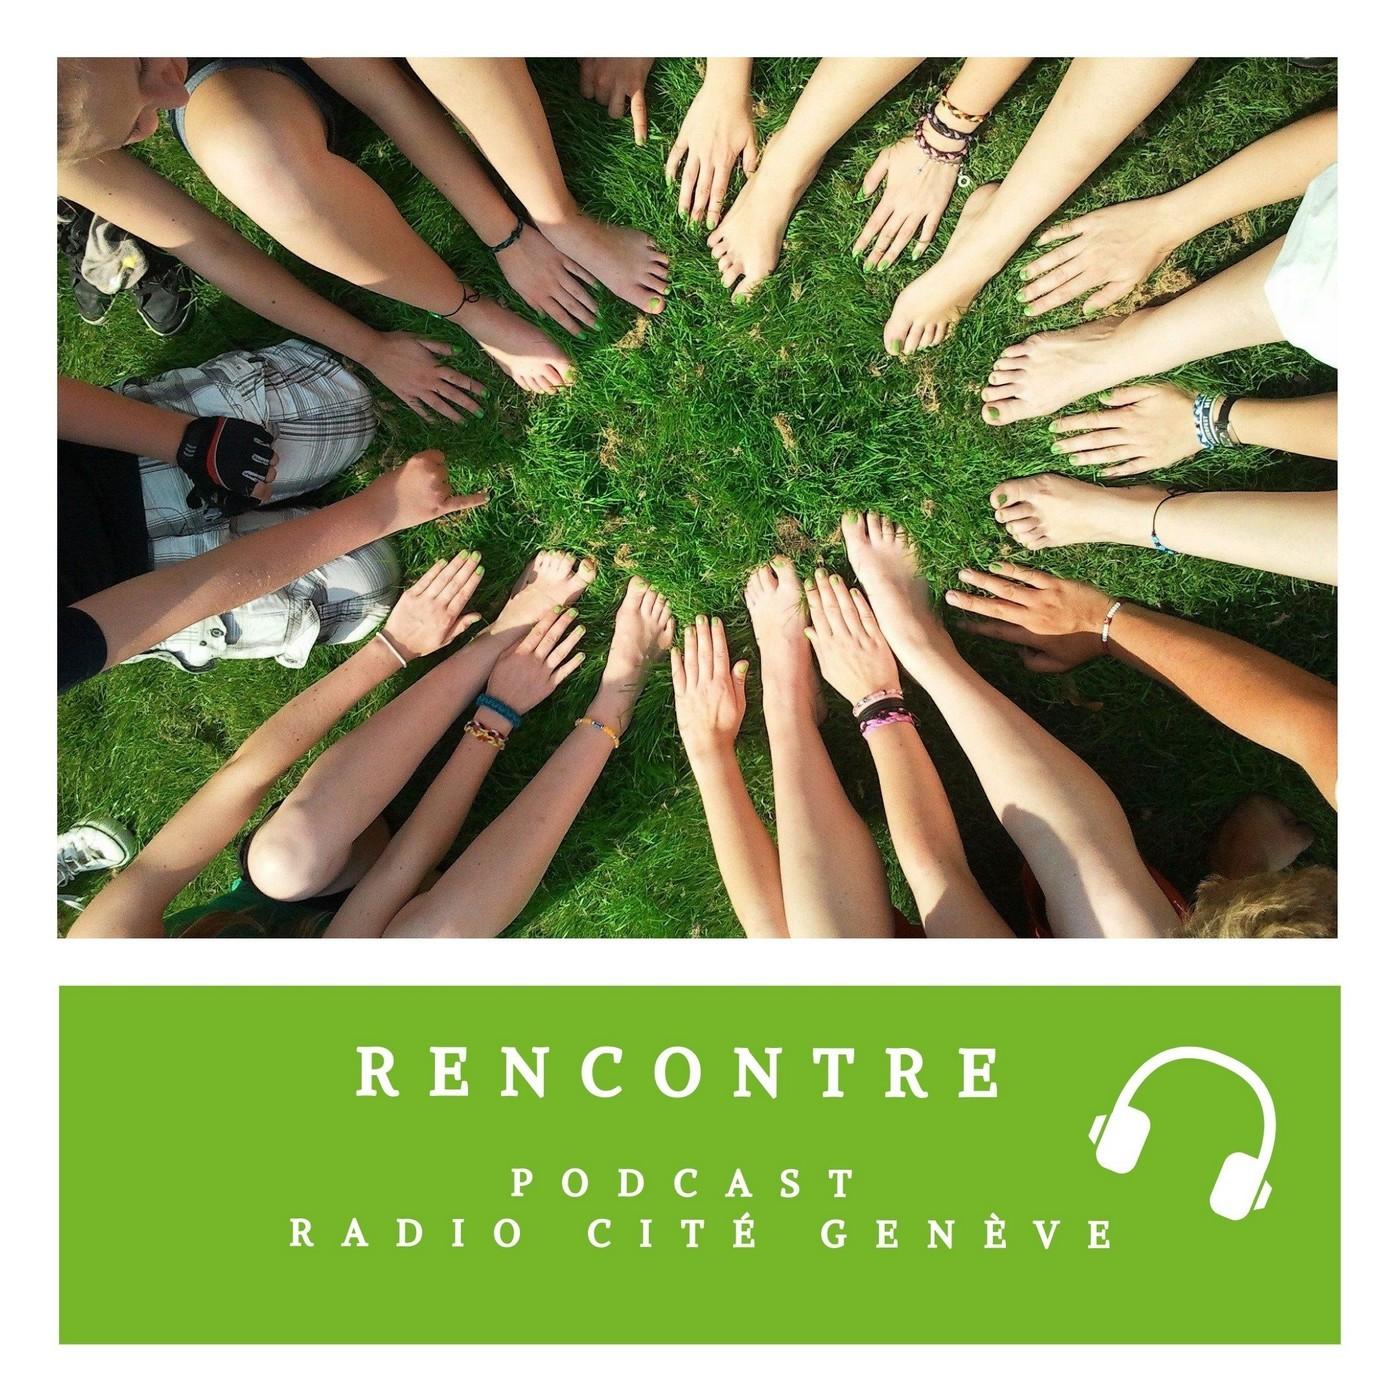 Rencontre du 23/02/21 - Martine Pernoud